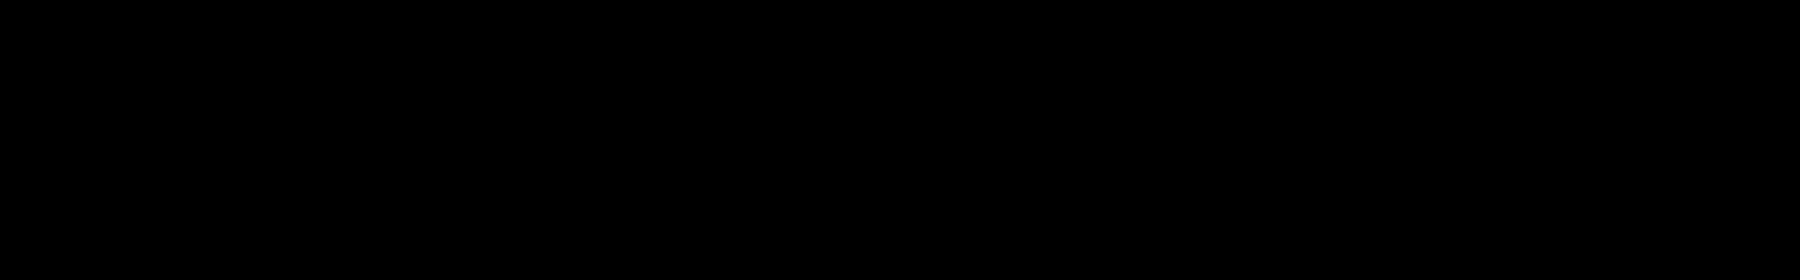 Plume - Downtempo Loops audio waveform